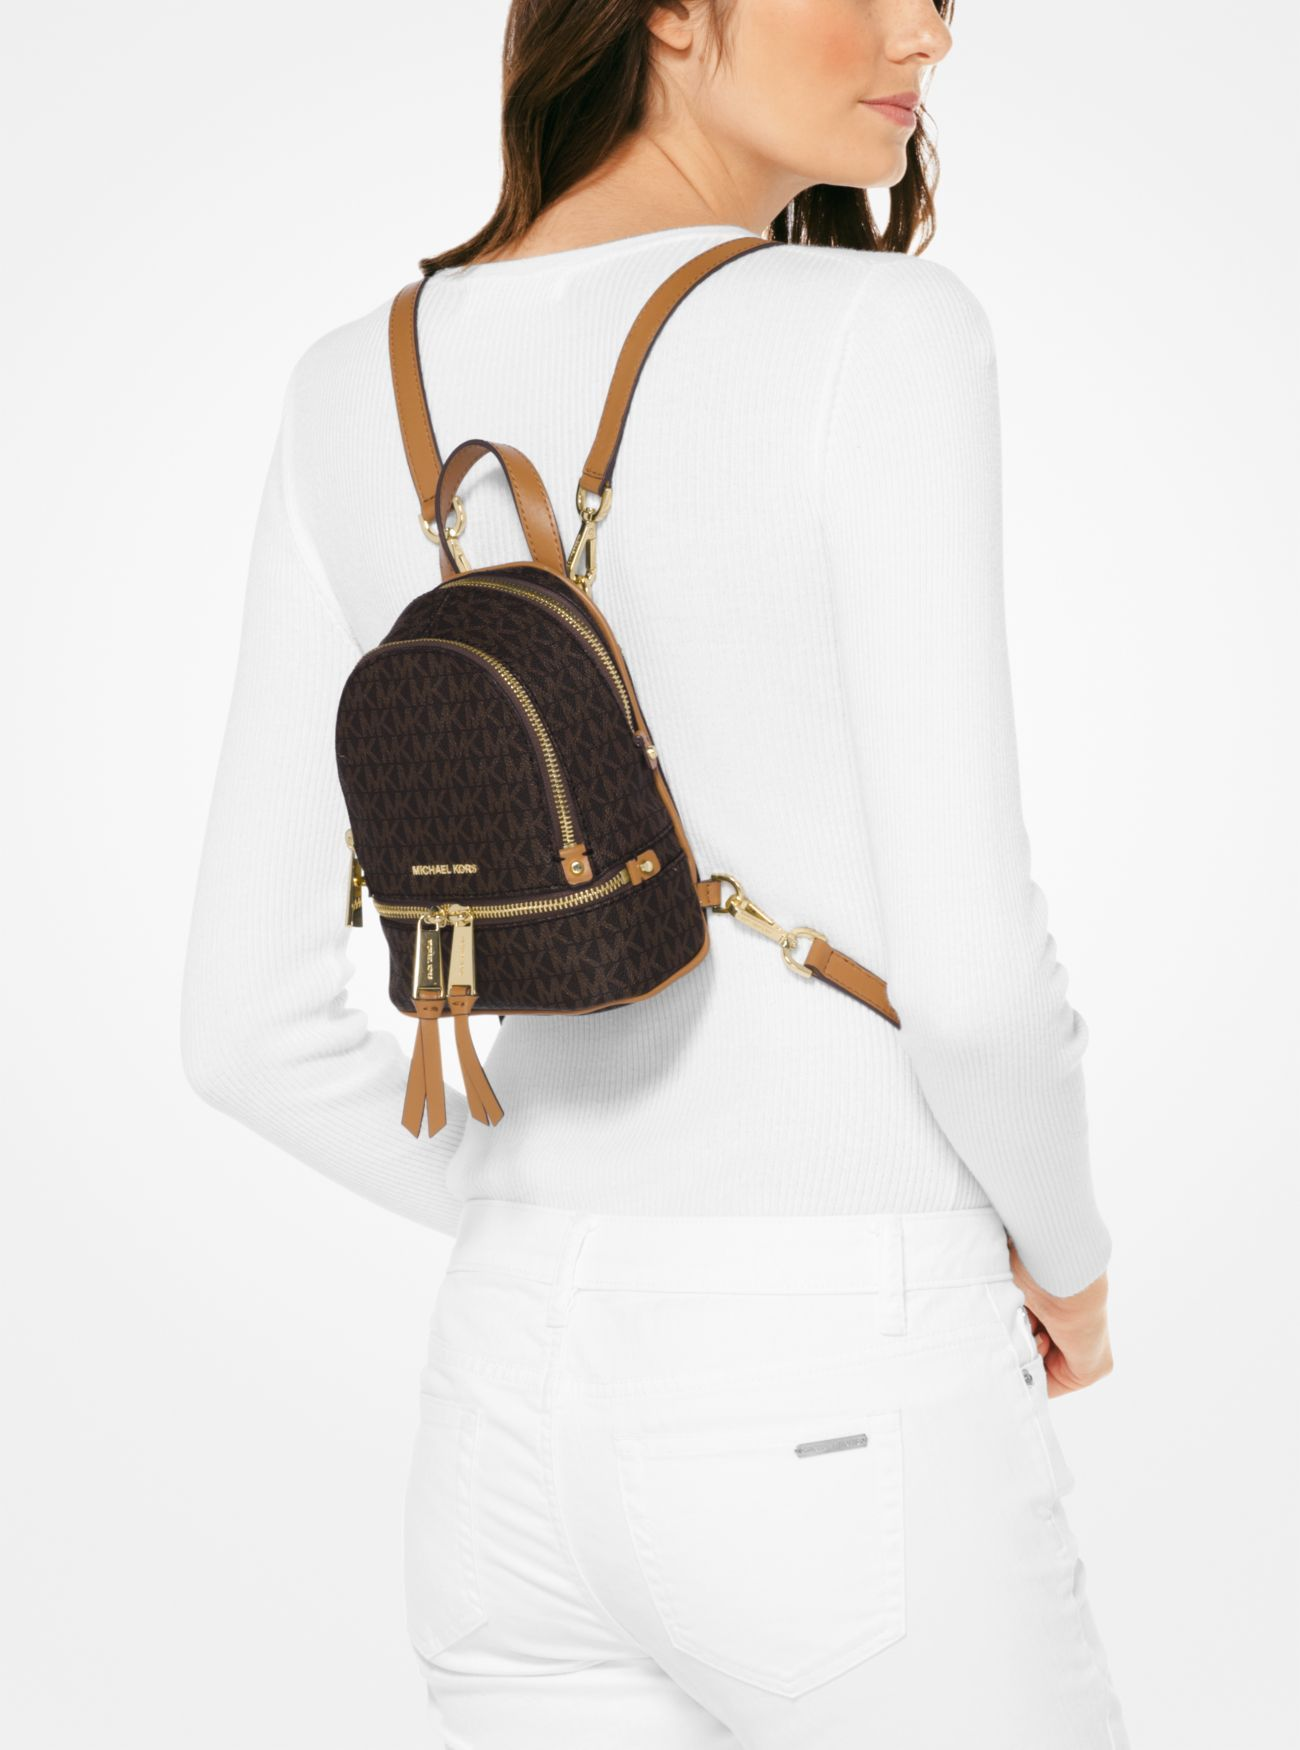 16eea2393b45 Rhea Mini Logo Backpack | Women's Handbags | Michael kors mini ...